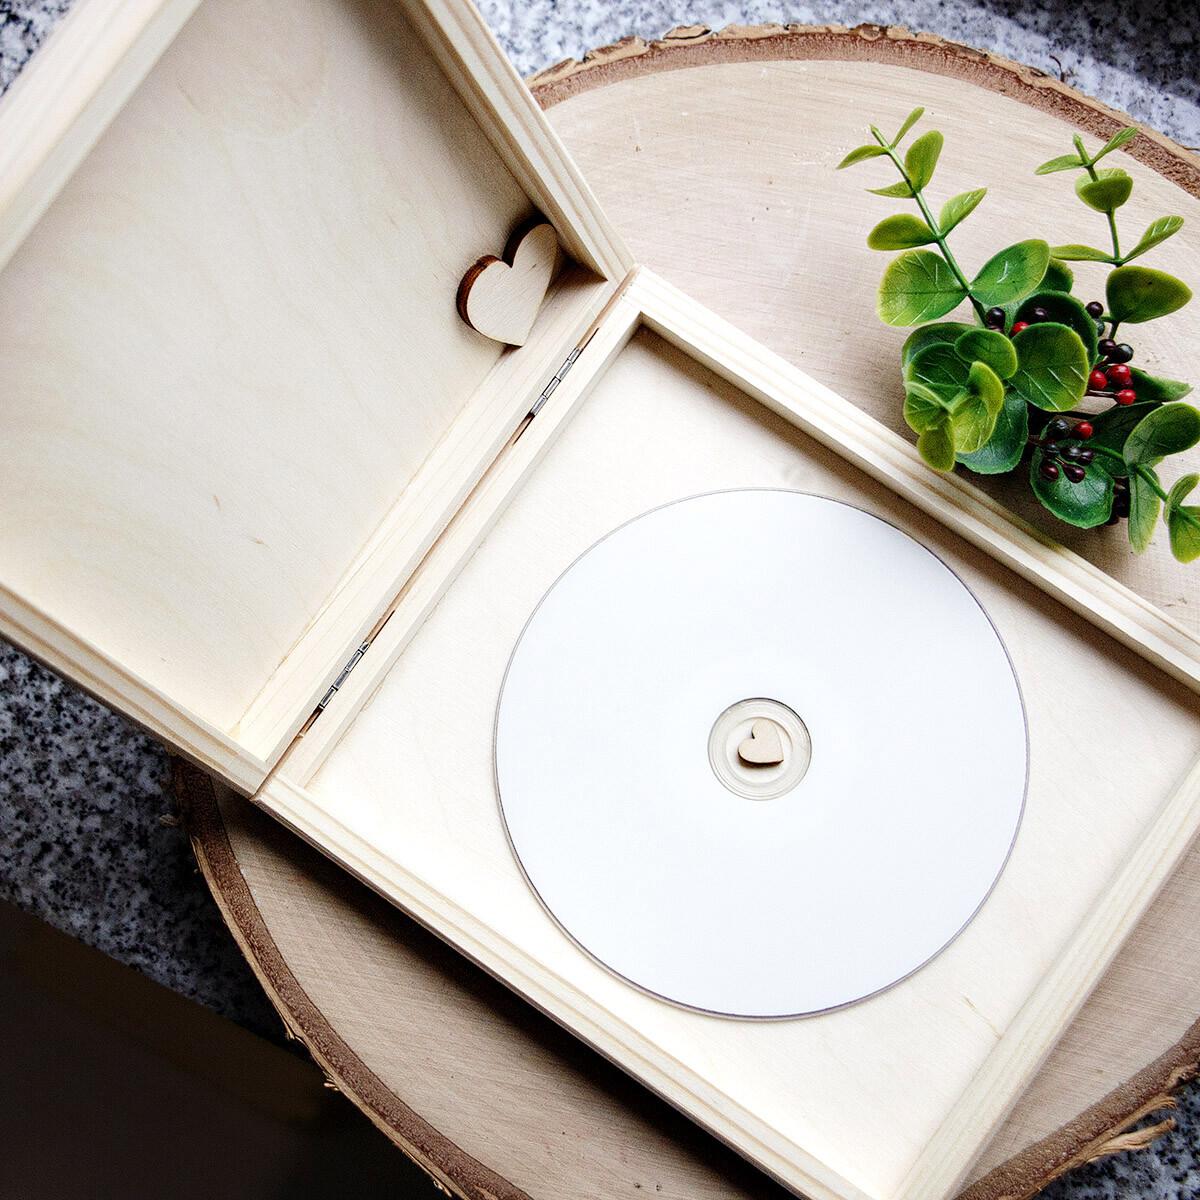 cd box 16 5 x 14 5 x 2 5 cm holzkiste klappkiste flache. Black Bedroom Furniture Sets. Home Design Ideas